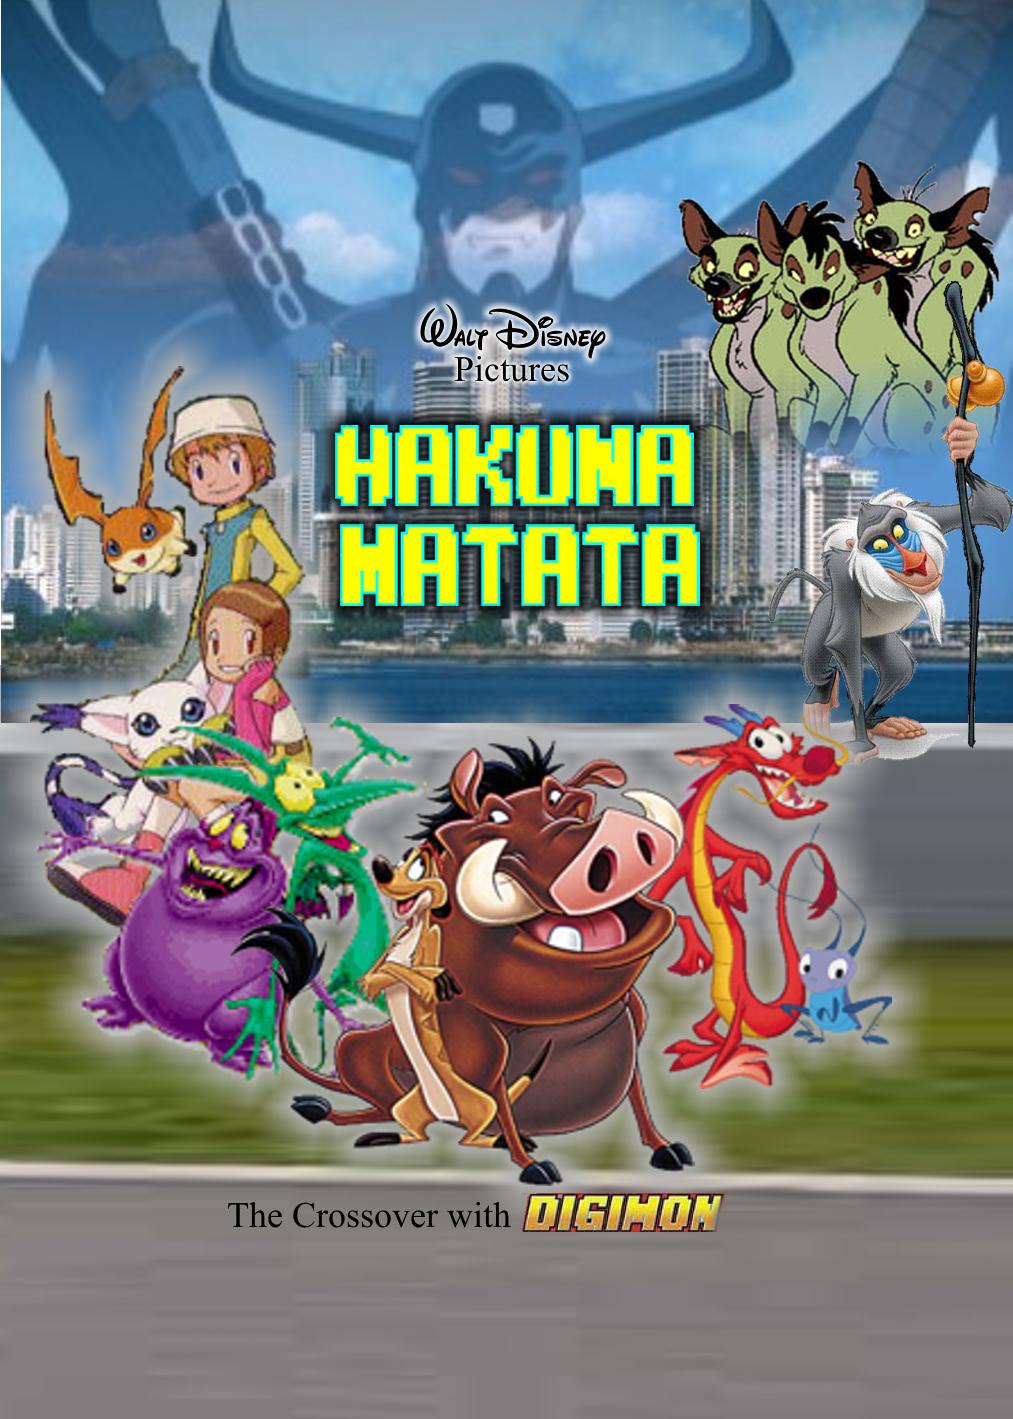 Disney's Hakuna Matata (The Crossovers with Digimon)